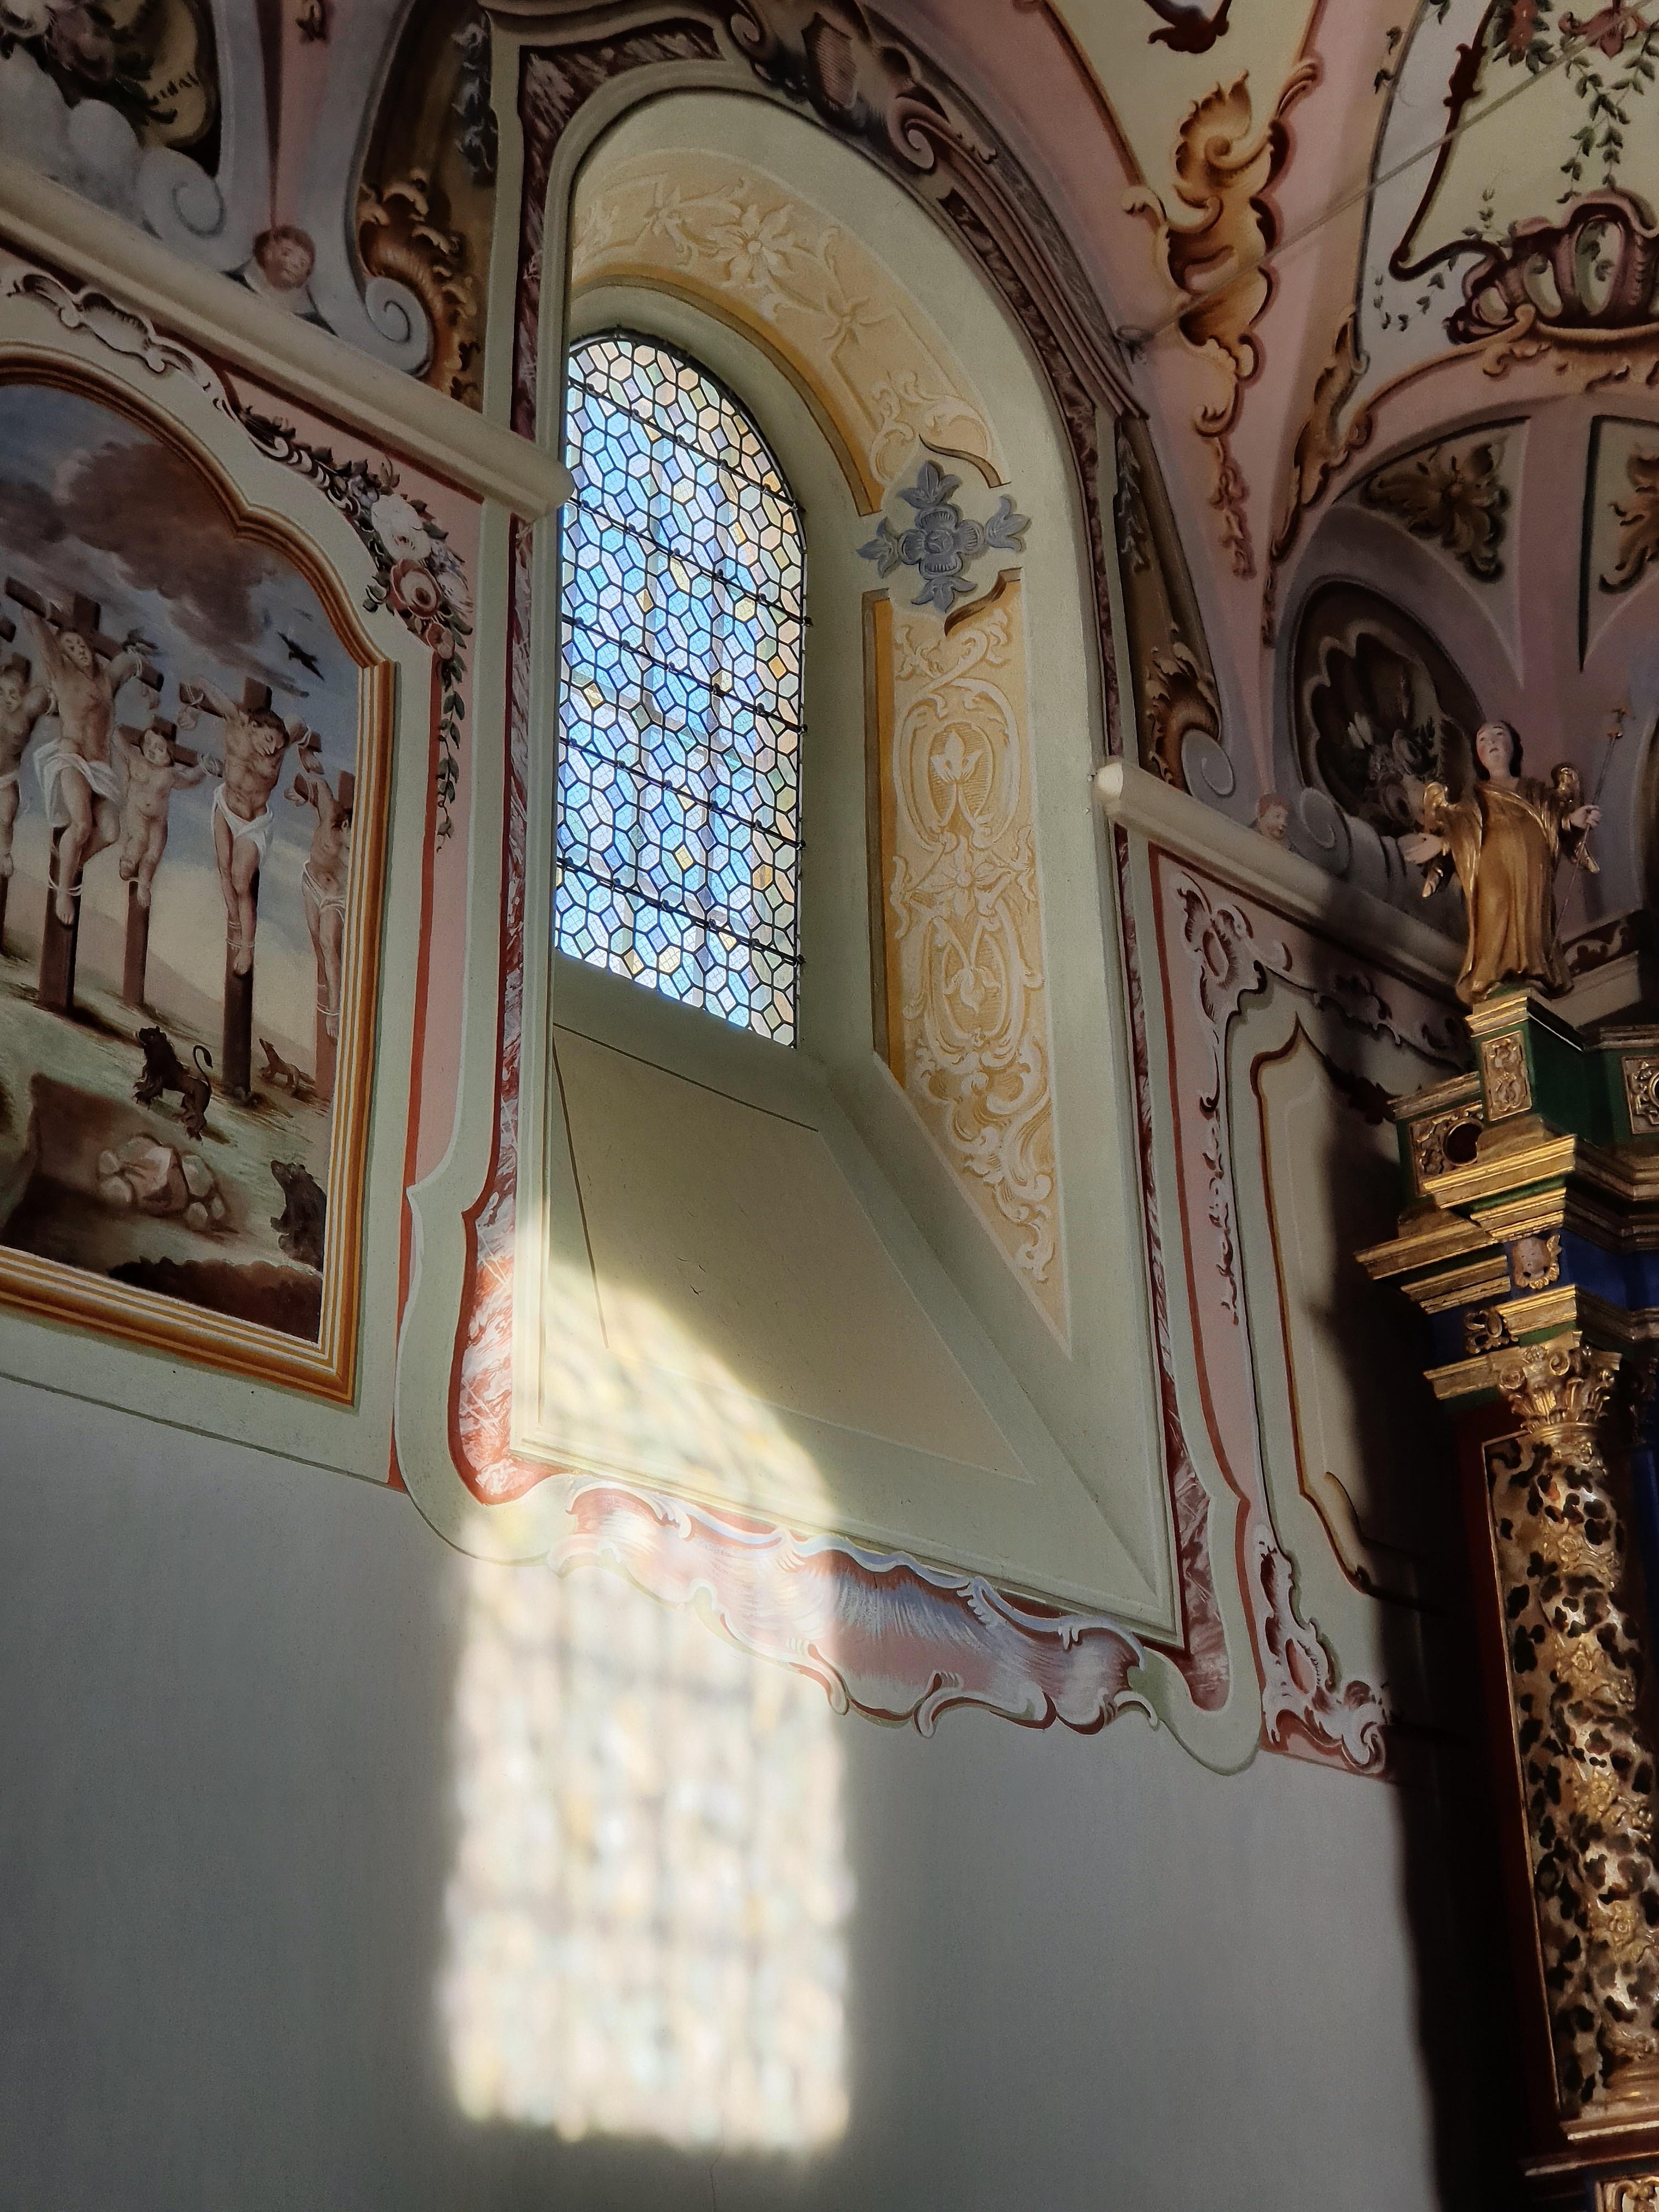 Interior Design of the Chapel Notre Dame des Venettes, Villandry in France